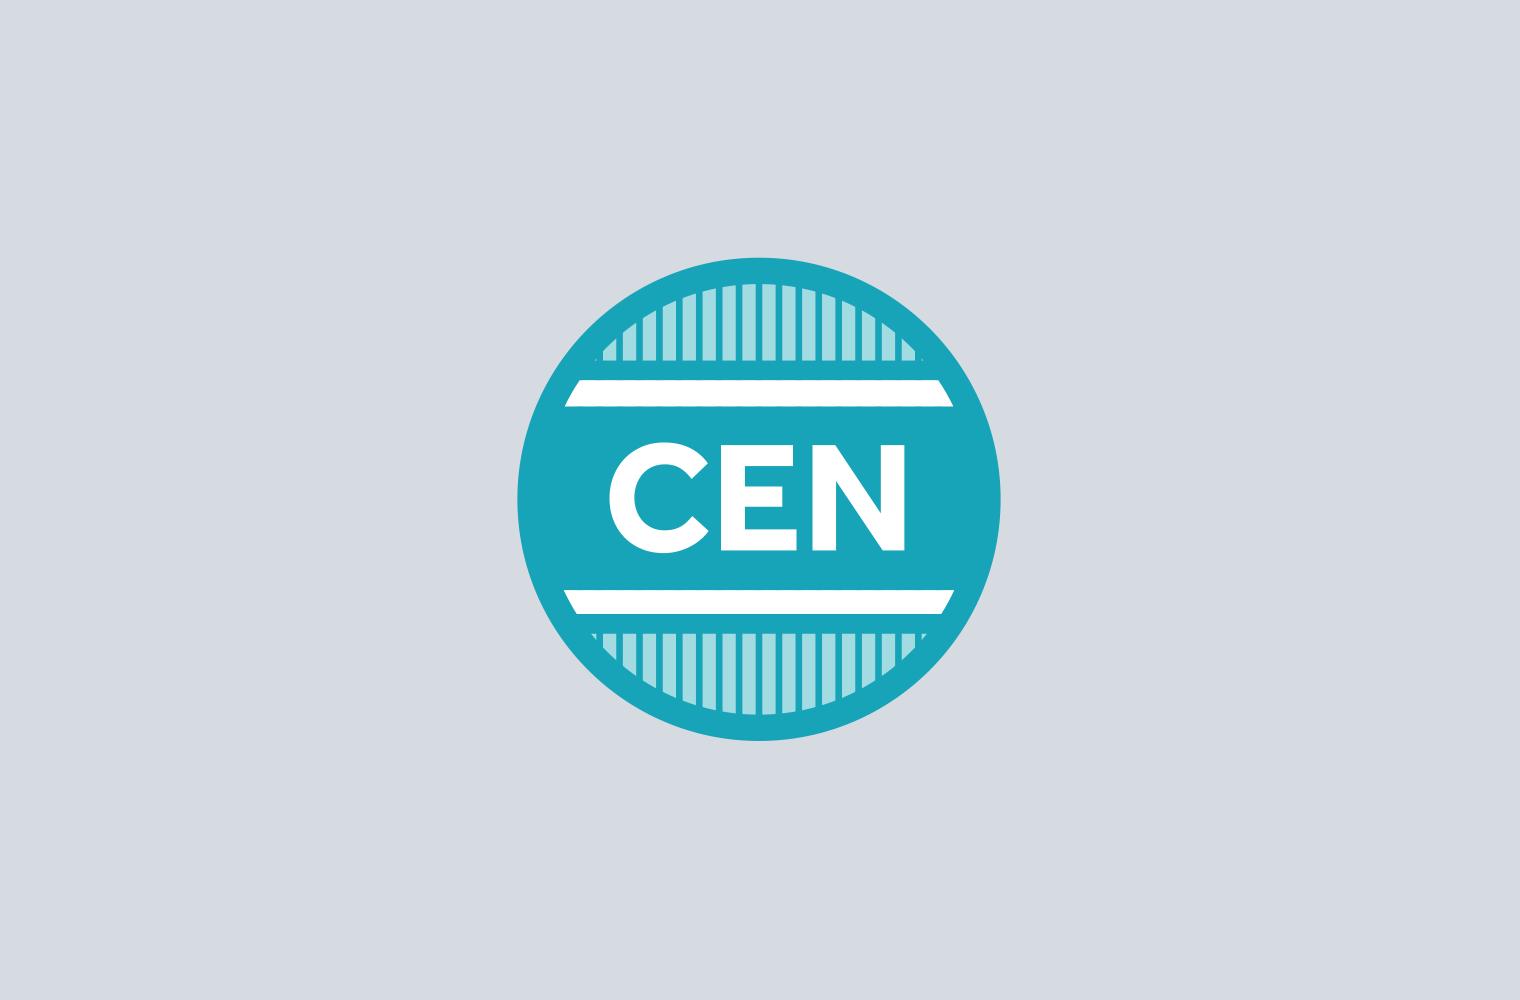 cen certification bcen